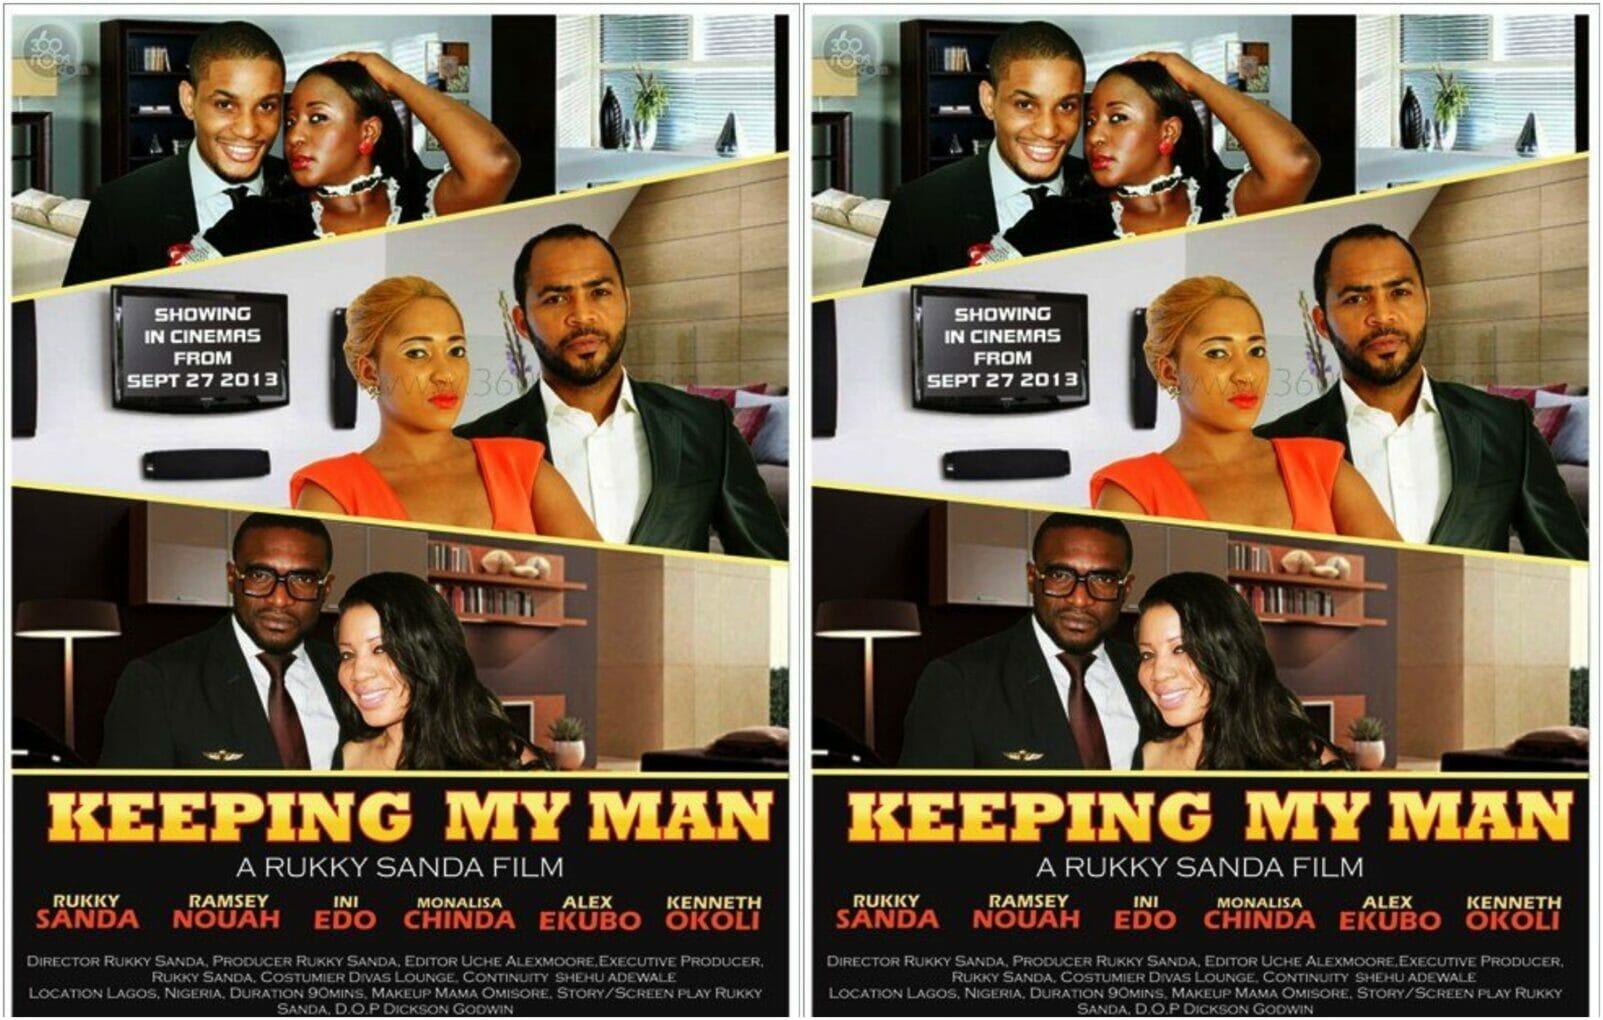 Keeping My Man movie